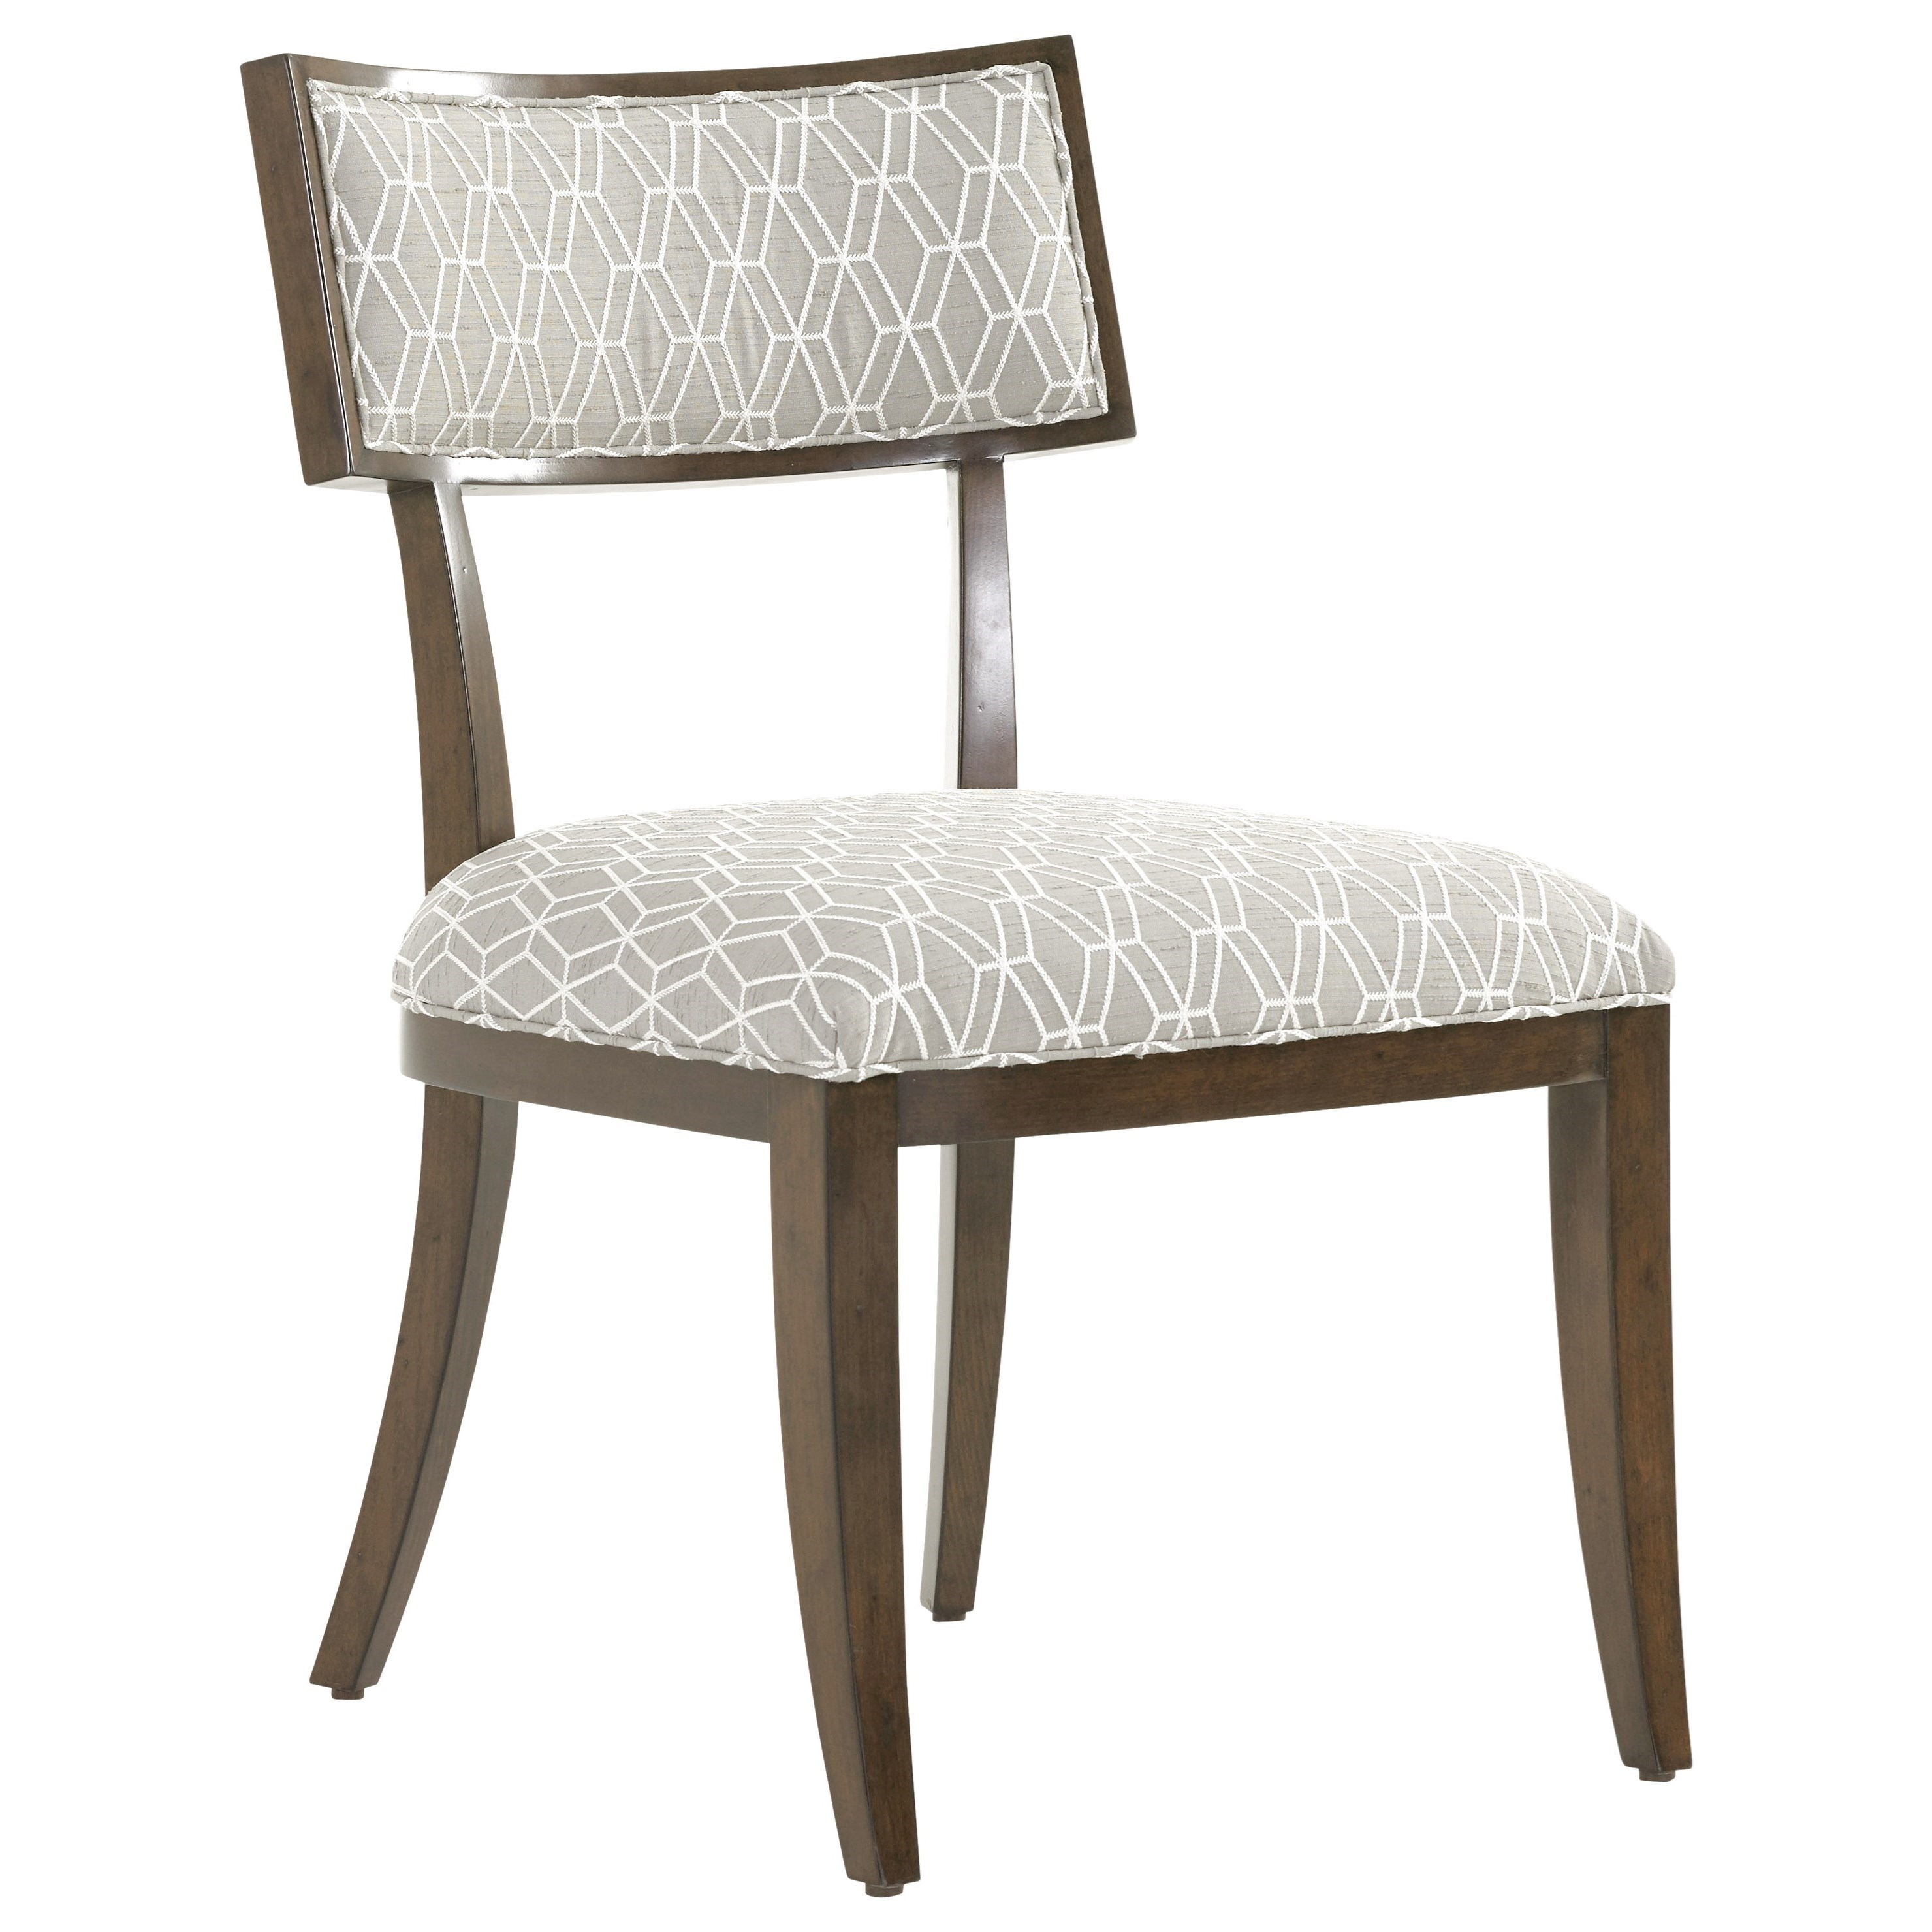 Lexington macarthur park 729 880 whittier side chair in for Park chair design